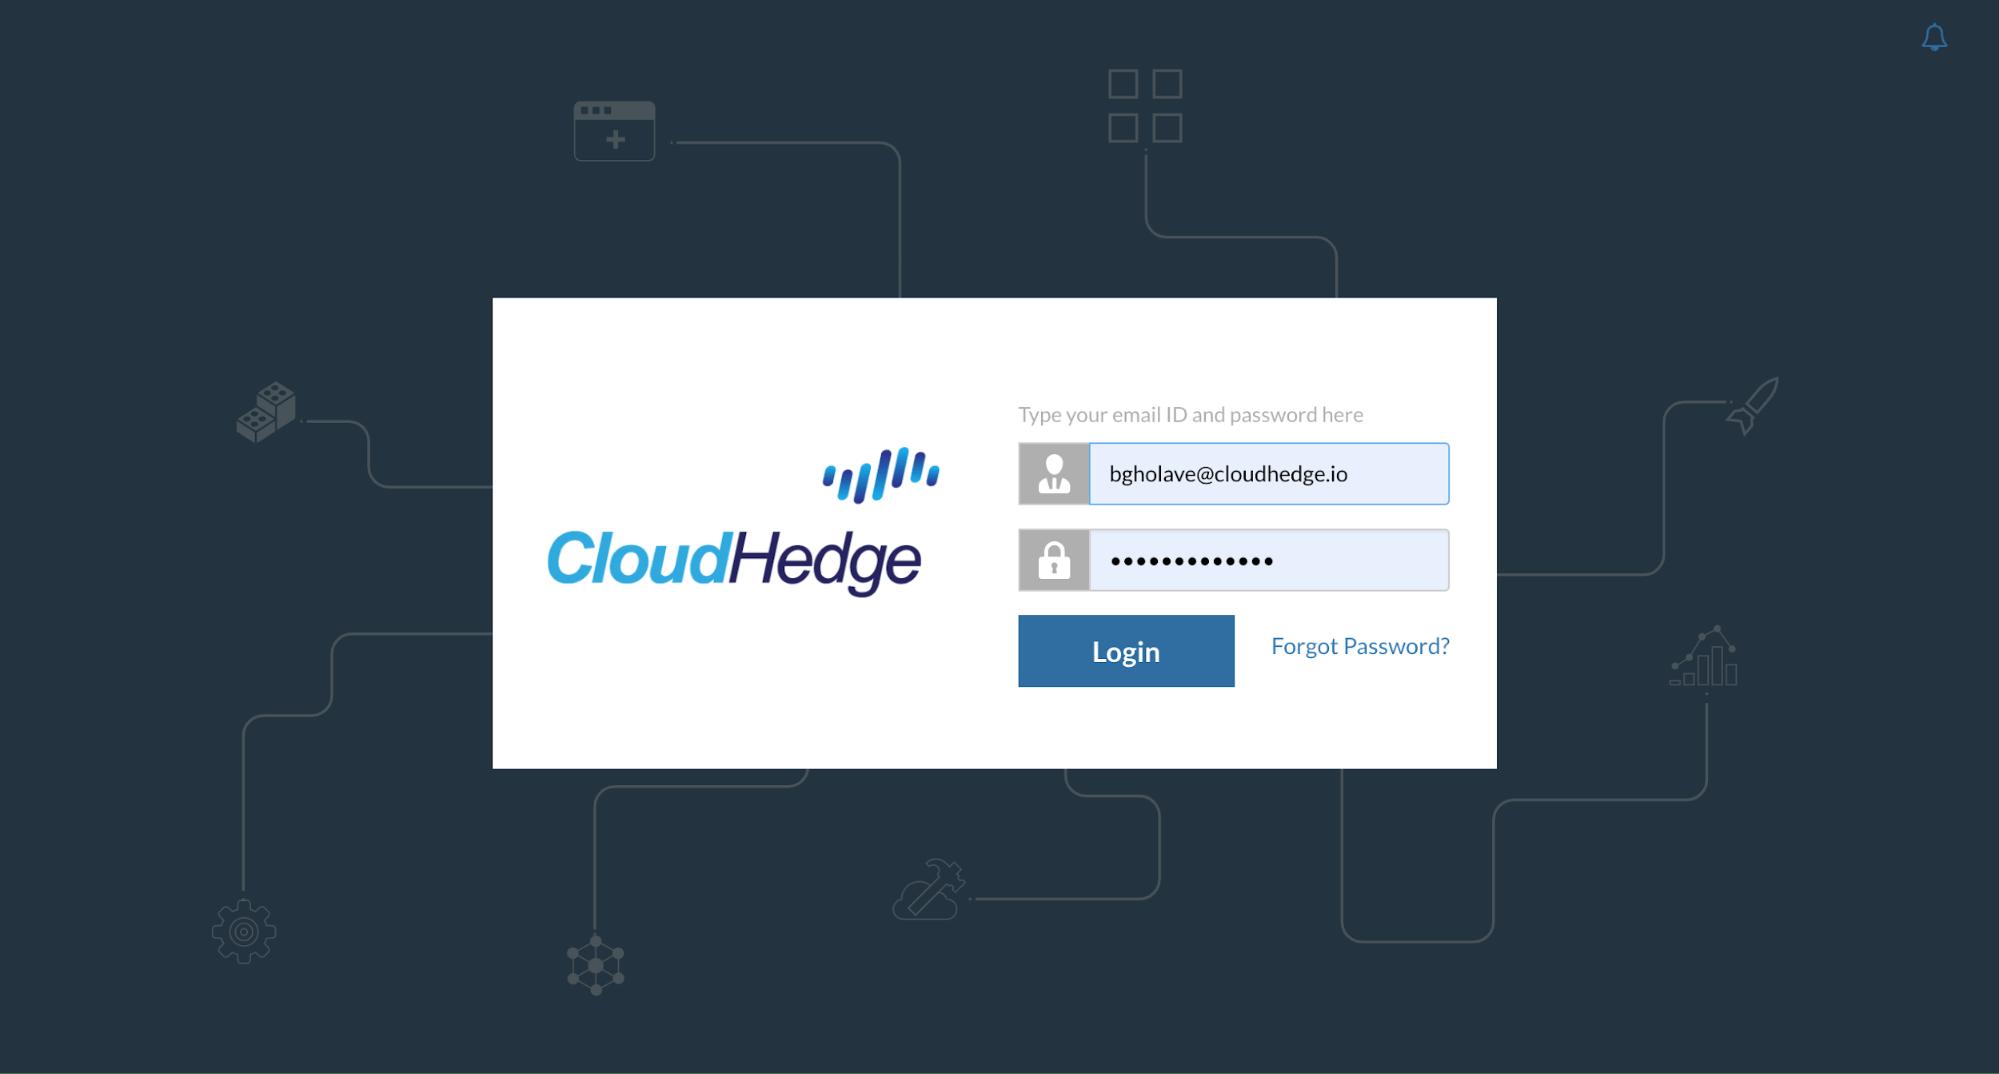 CloudHedge Login